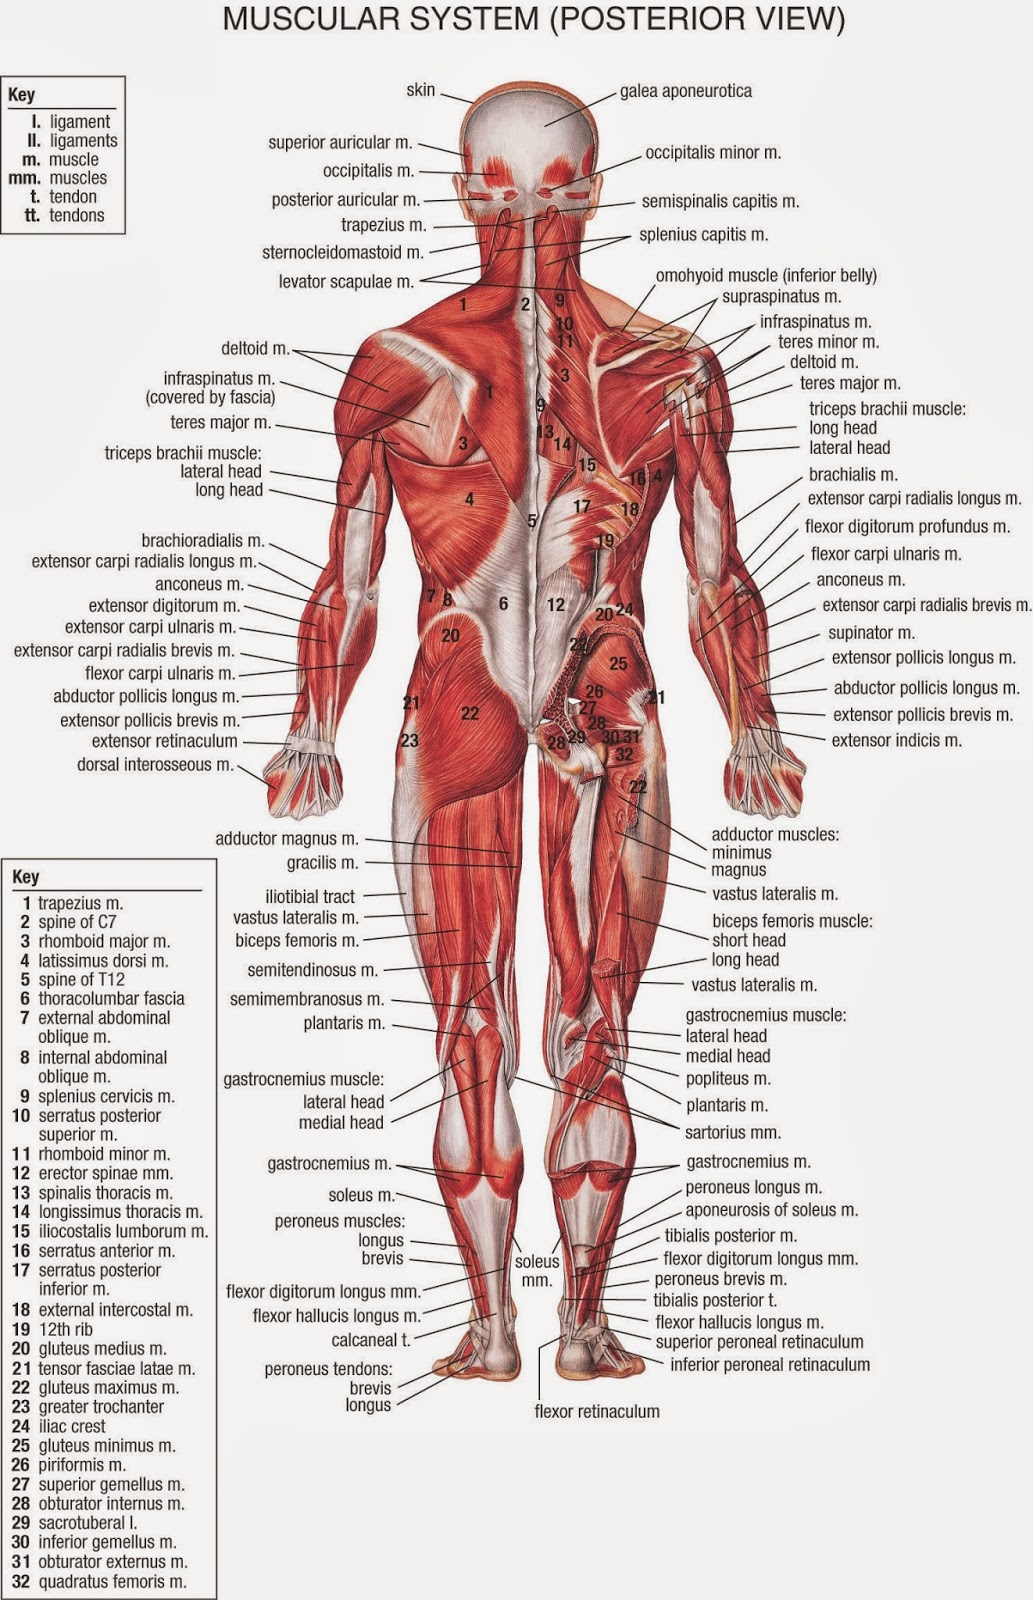 The Most Wonderful Creature: Human Body Anatomy